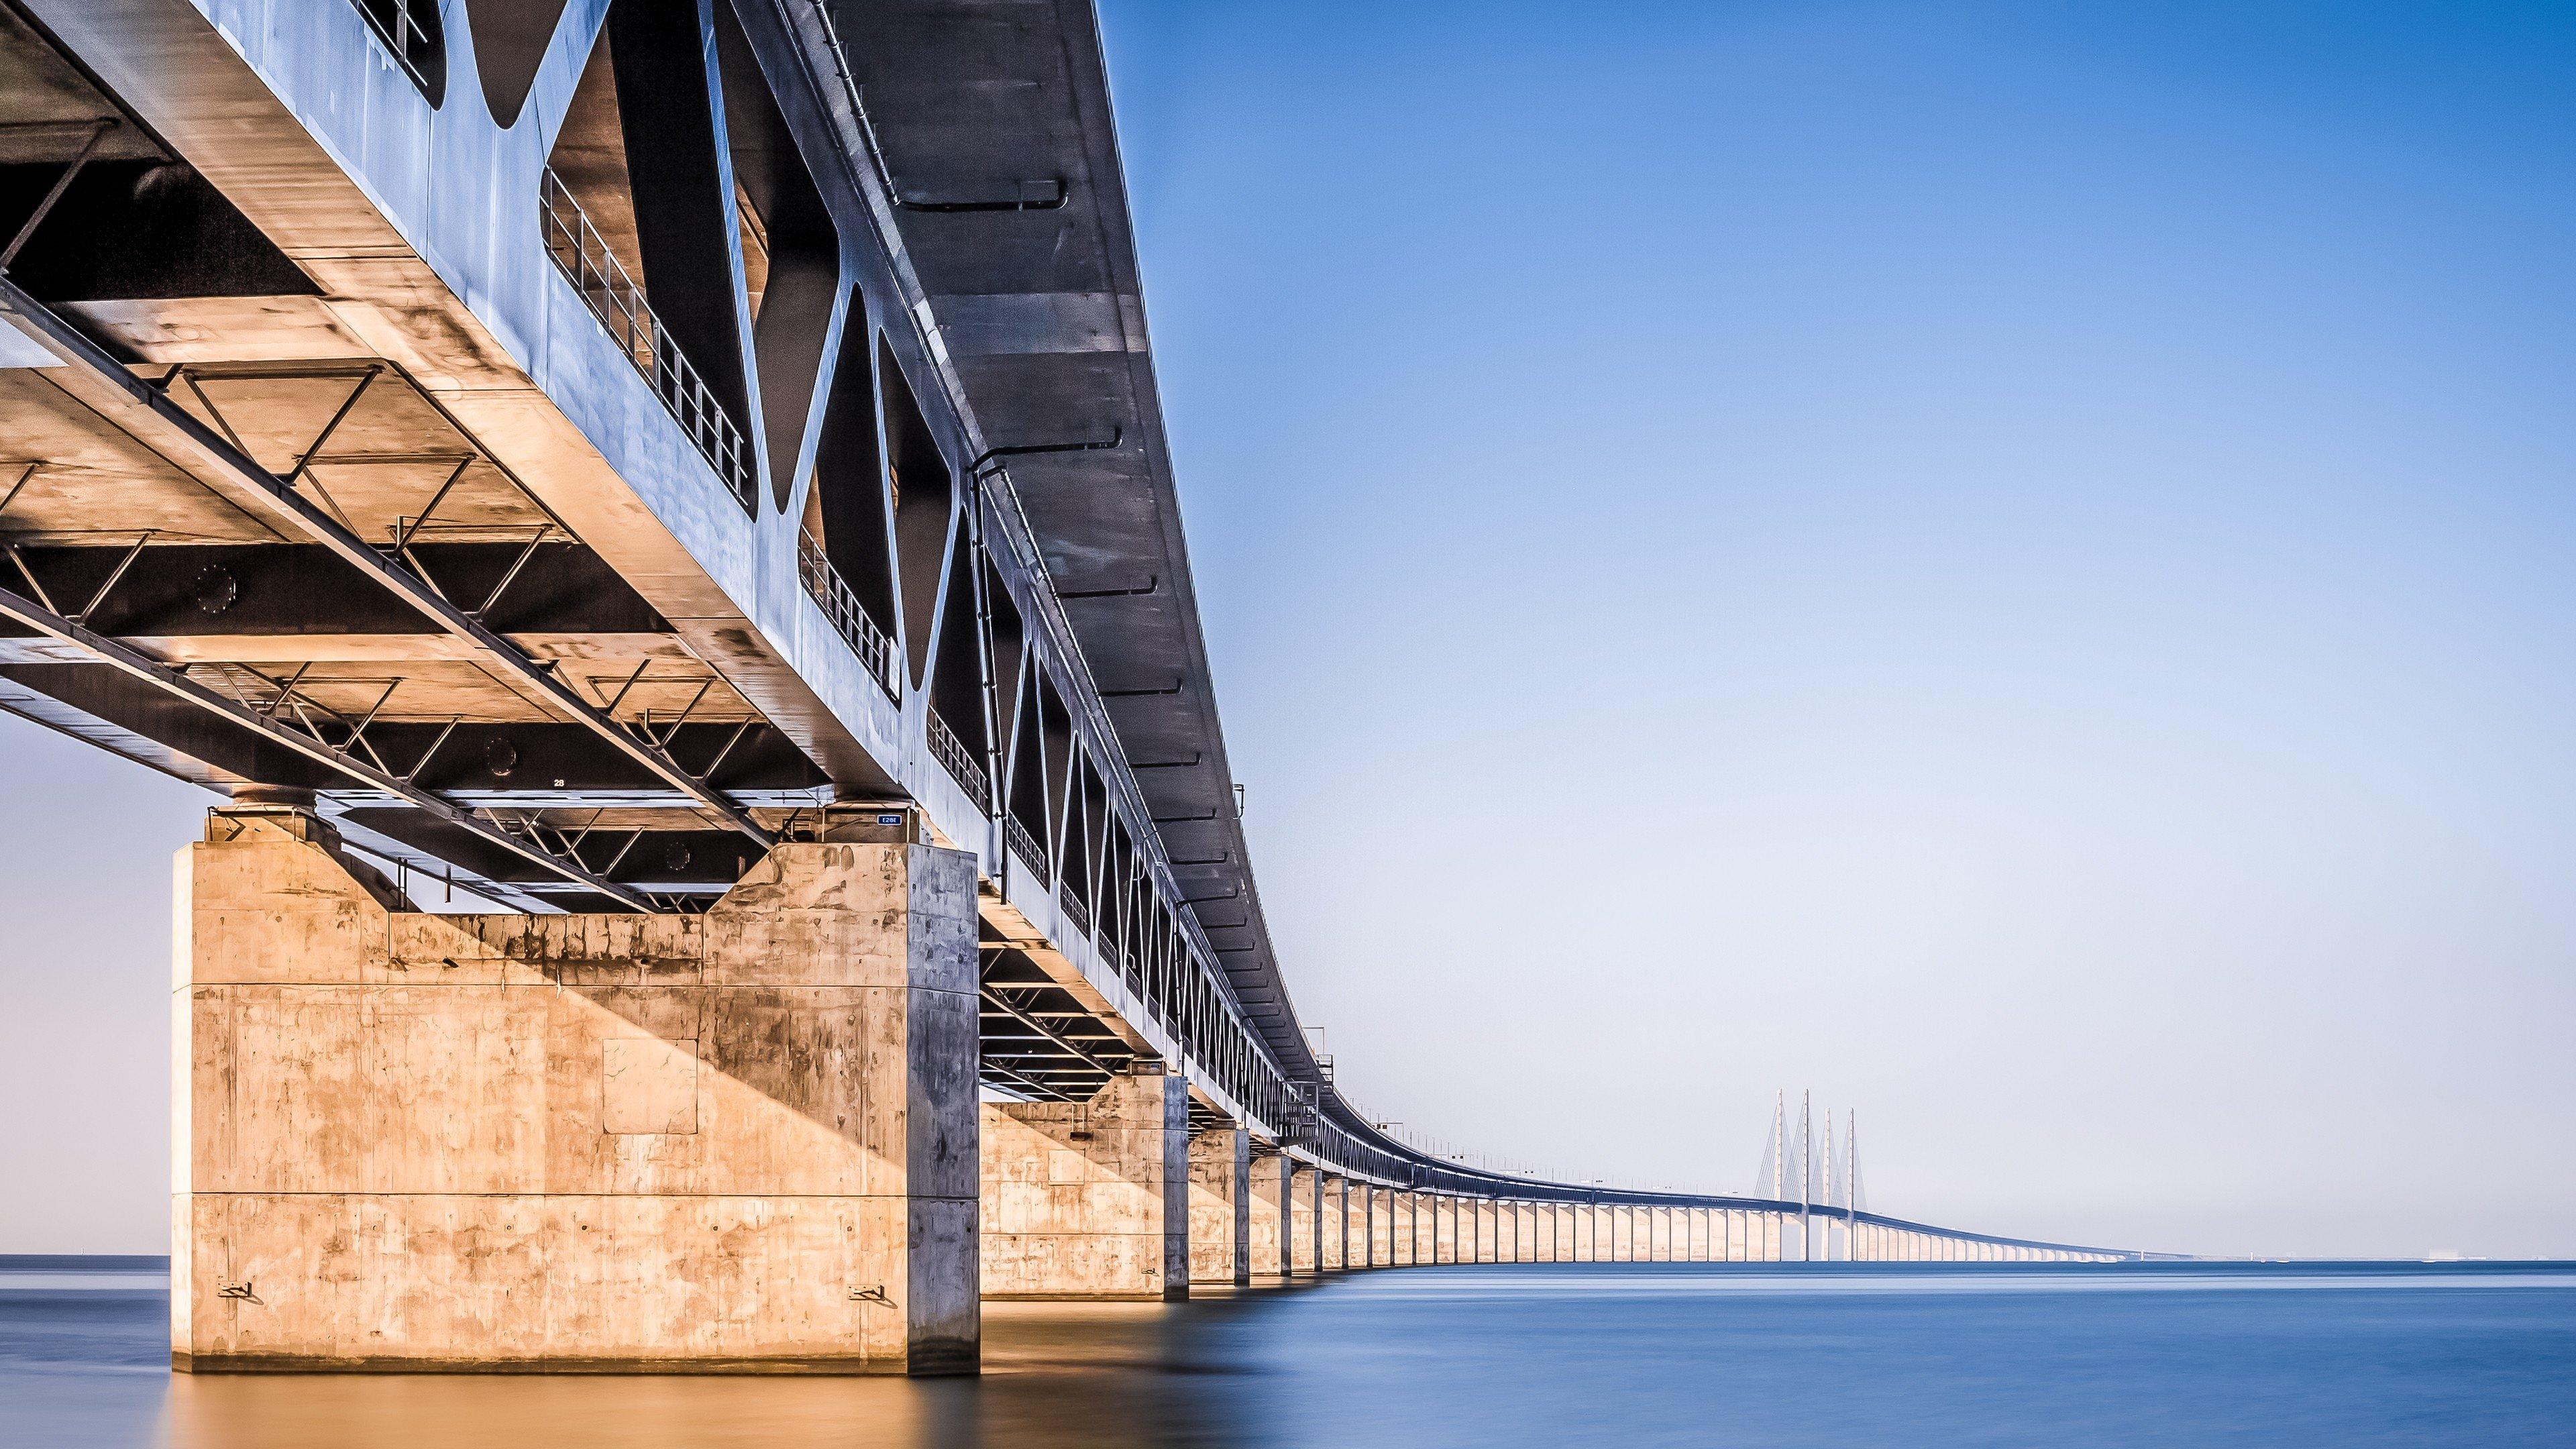 Bridge oresund bridge hd wallpapers desktop and mobile - Bridge wallpaper hd ...